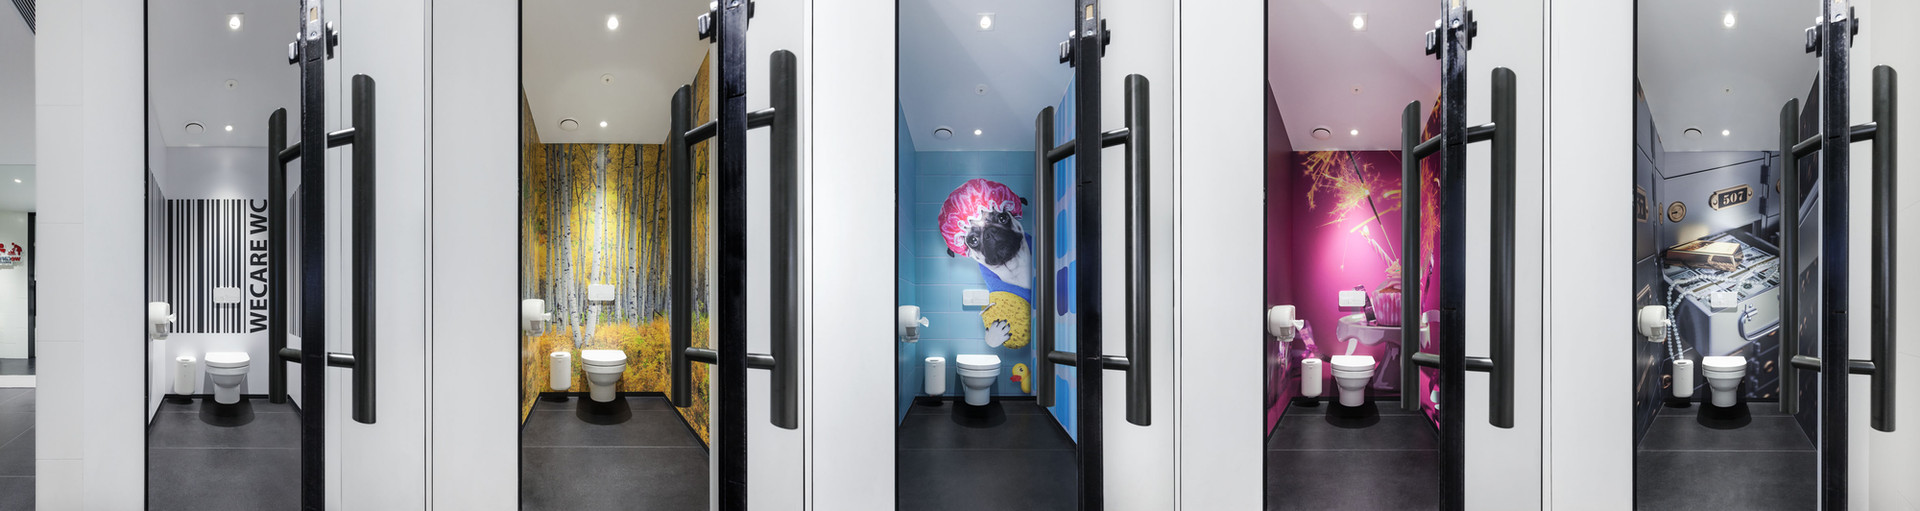 Female Toilet Collage.jpg